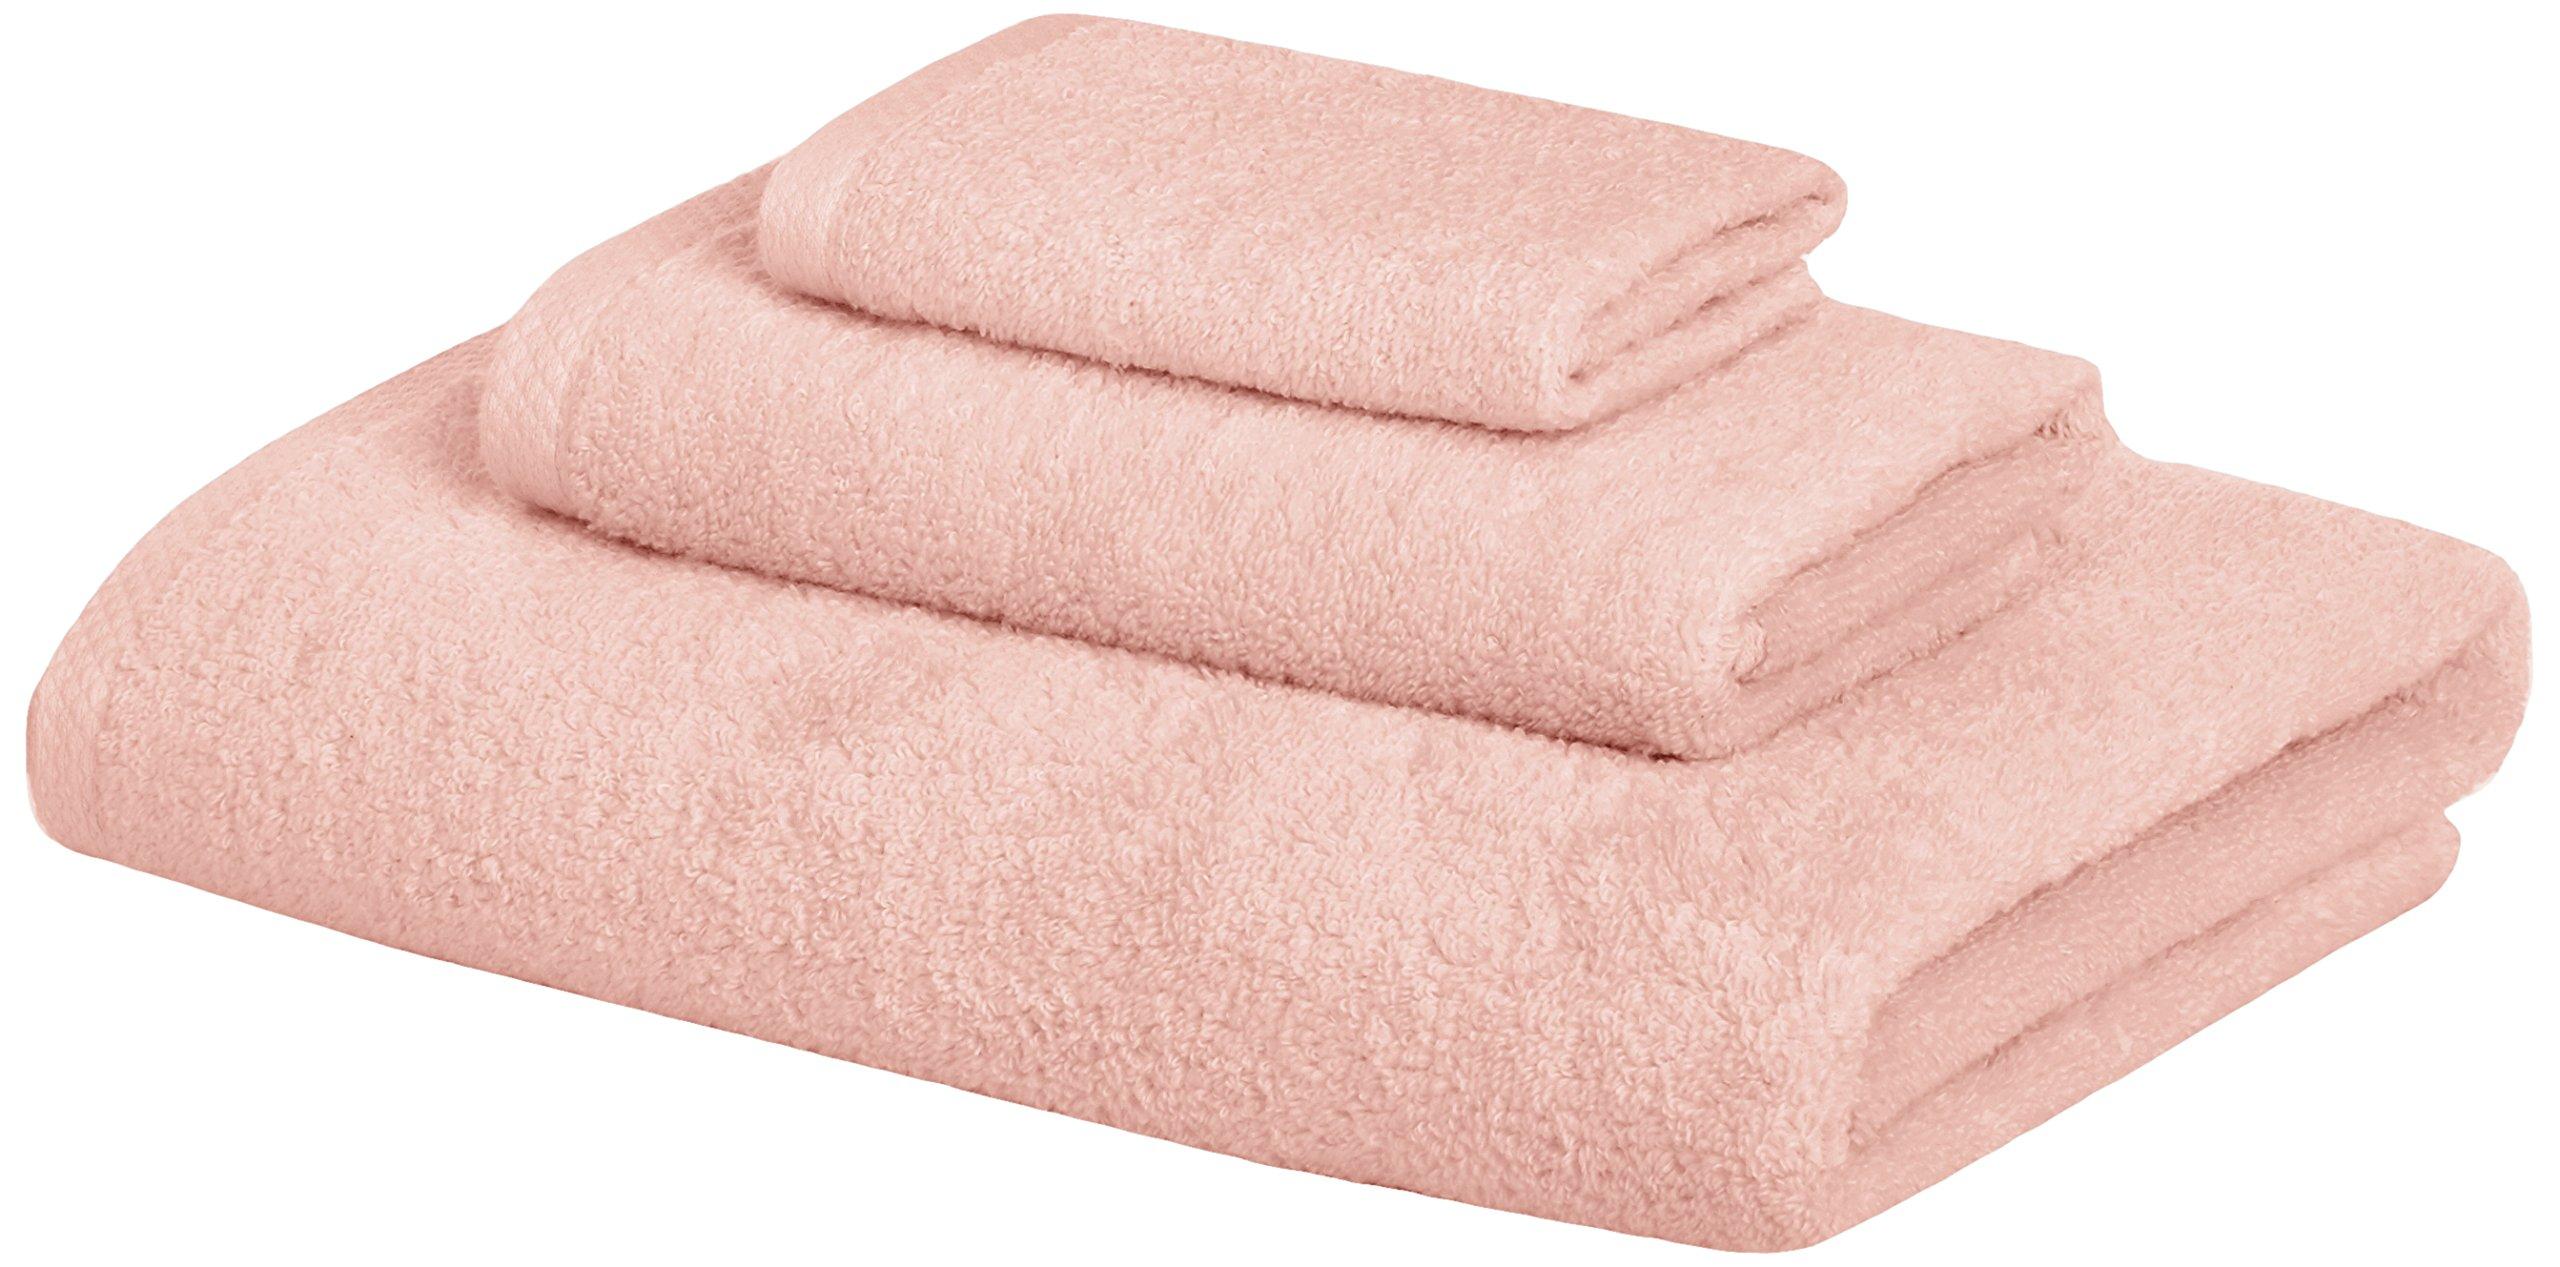 AmazonBasics Quick-Dry Towels - 100% Cotton, 3-Piece Set, Petal Pink